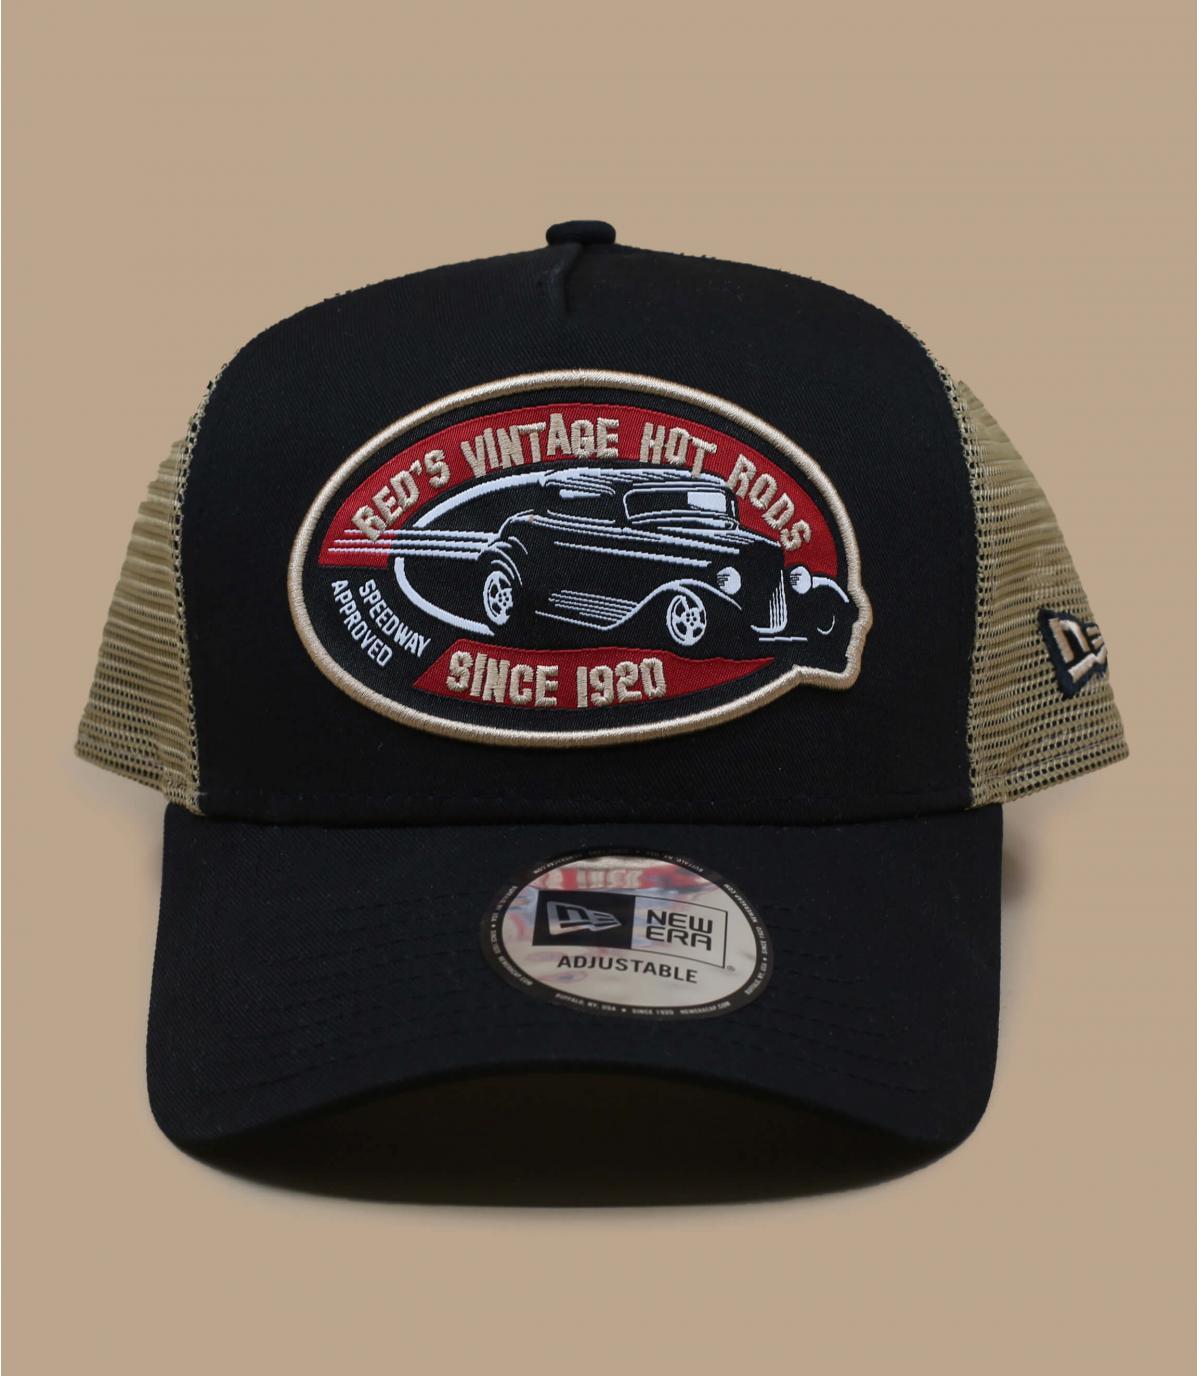 Dettagli Trucker Hot Rod black - image 2